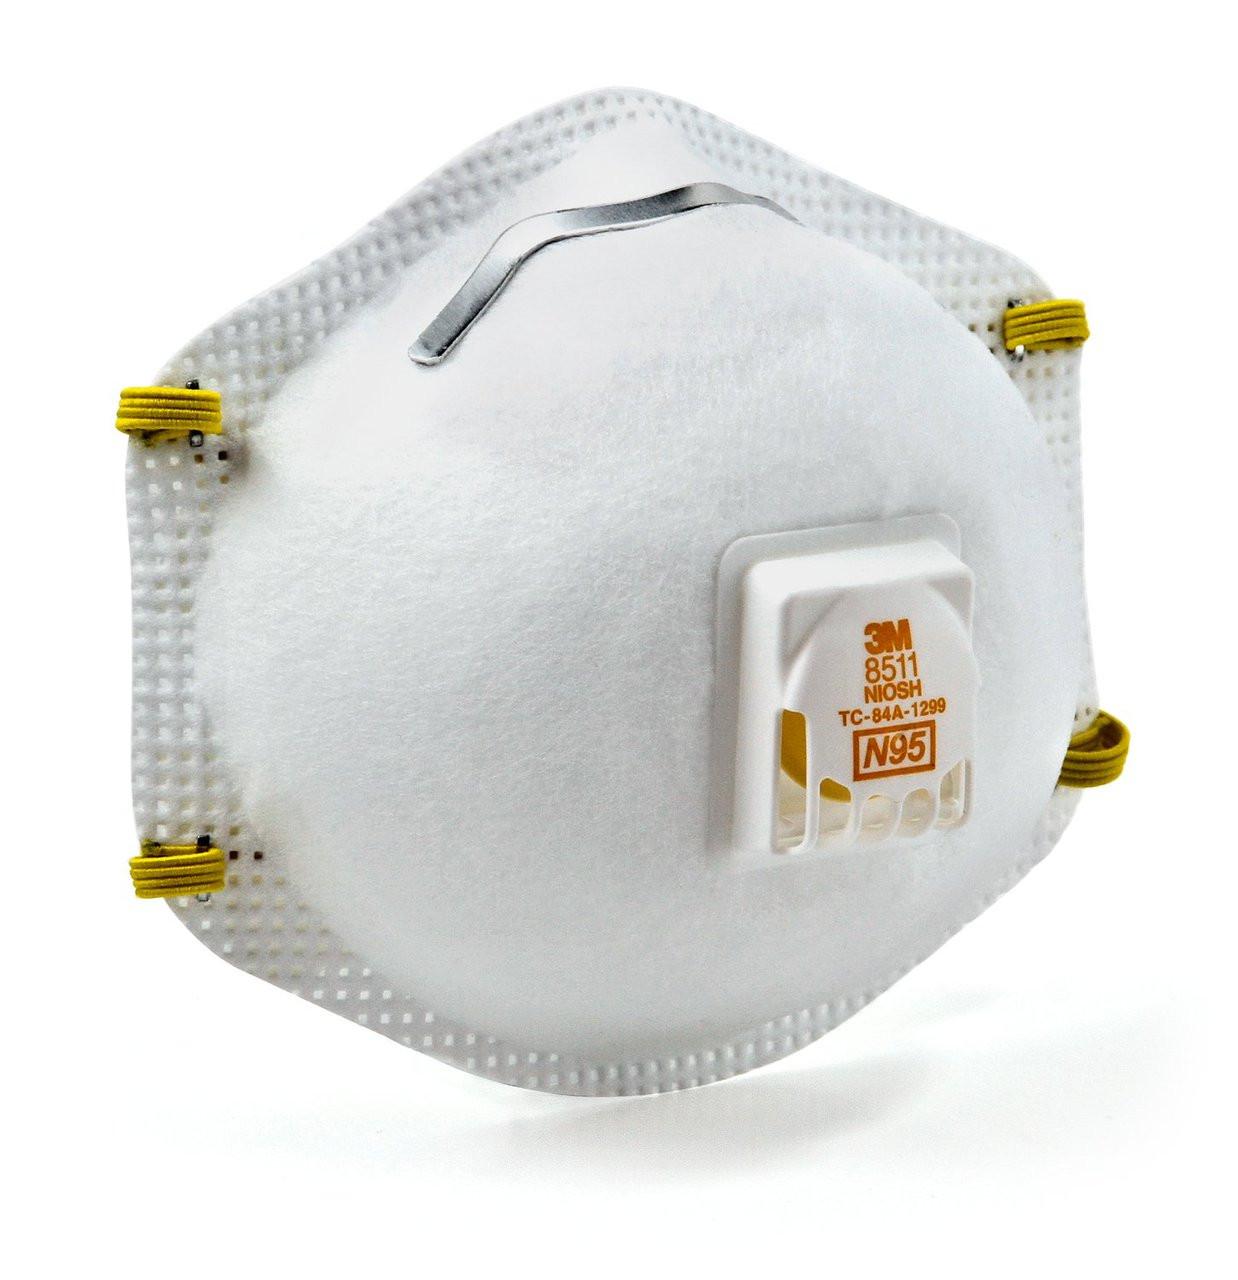 3M 8511 N95 Particulate Respirators - Box of 10